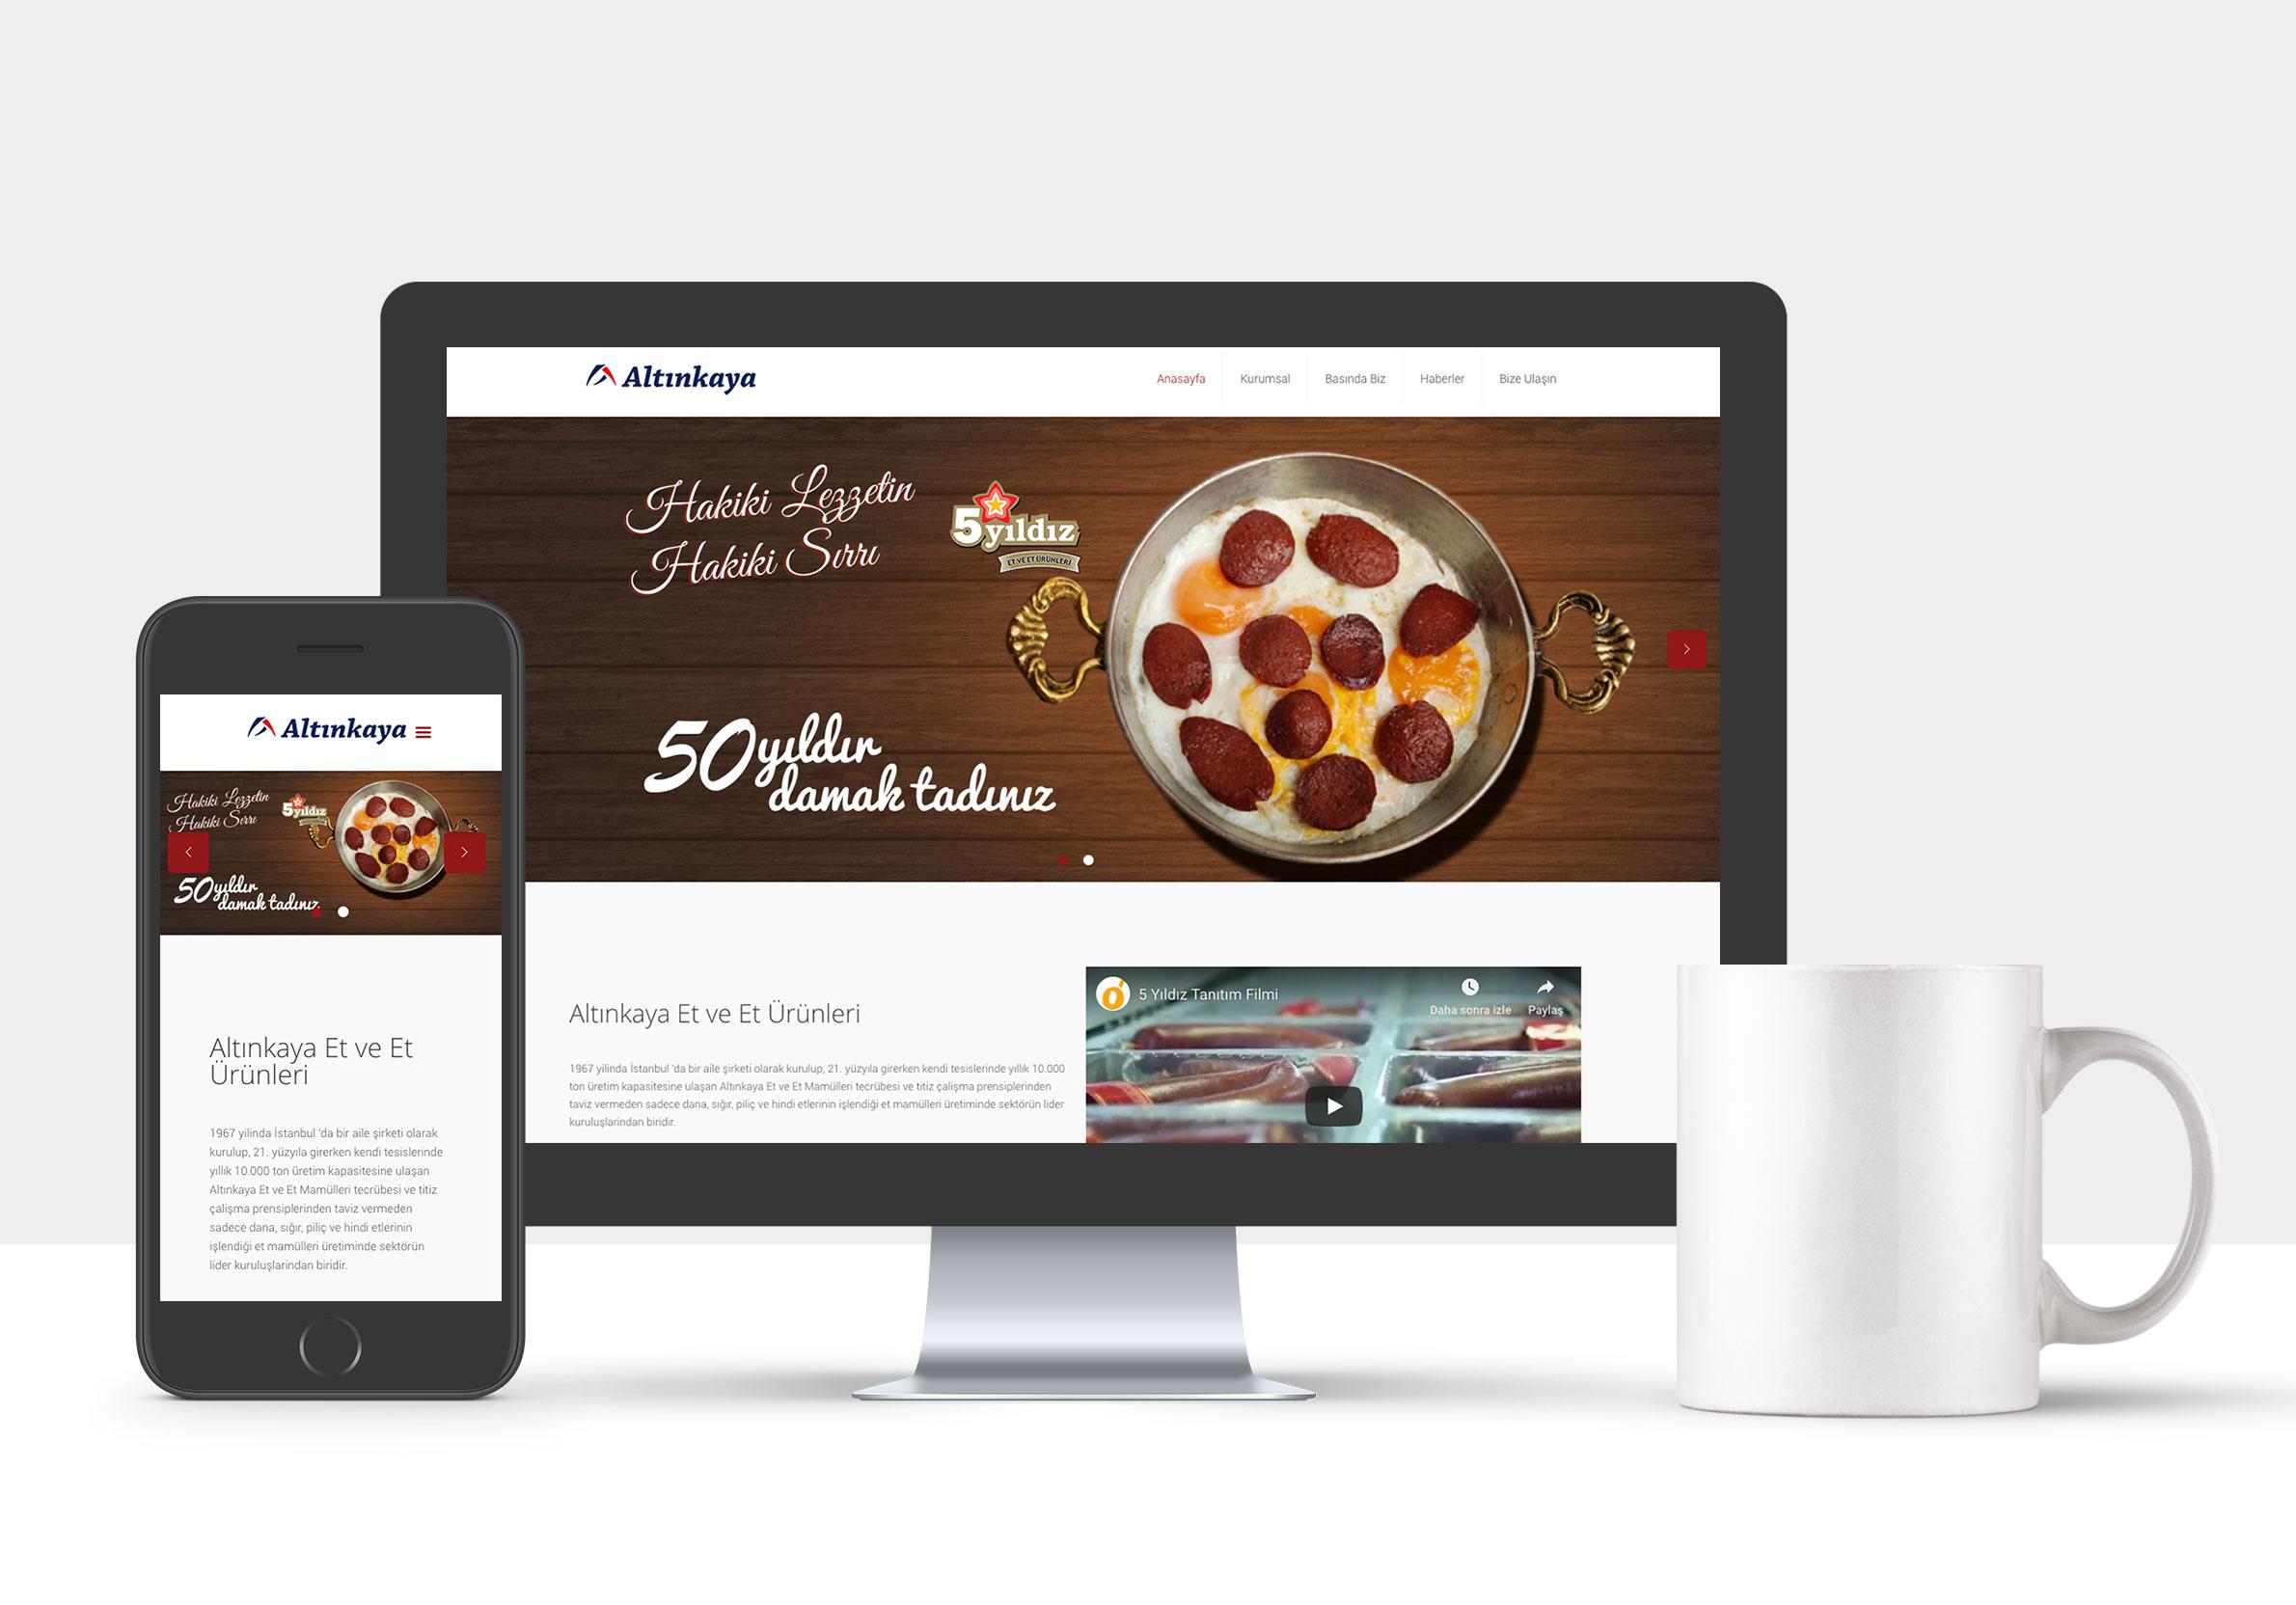 altinkaya-kurumsal-web-tasarim